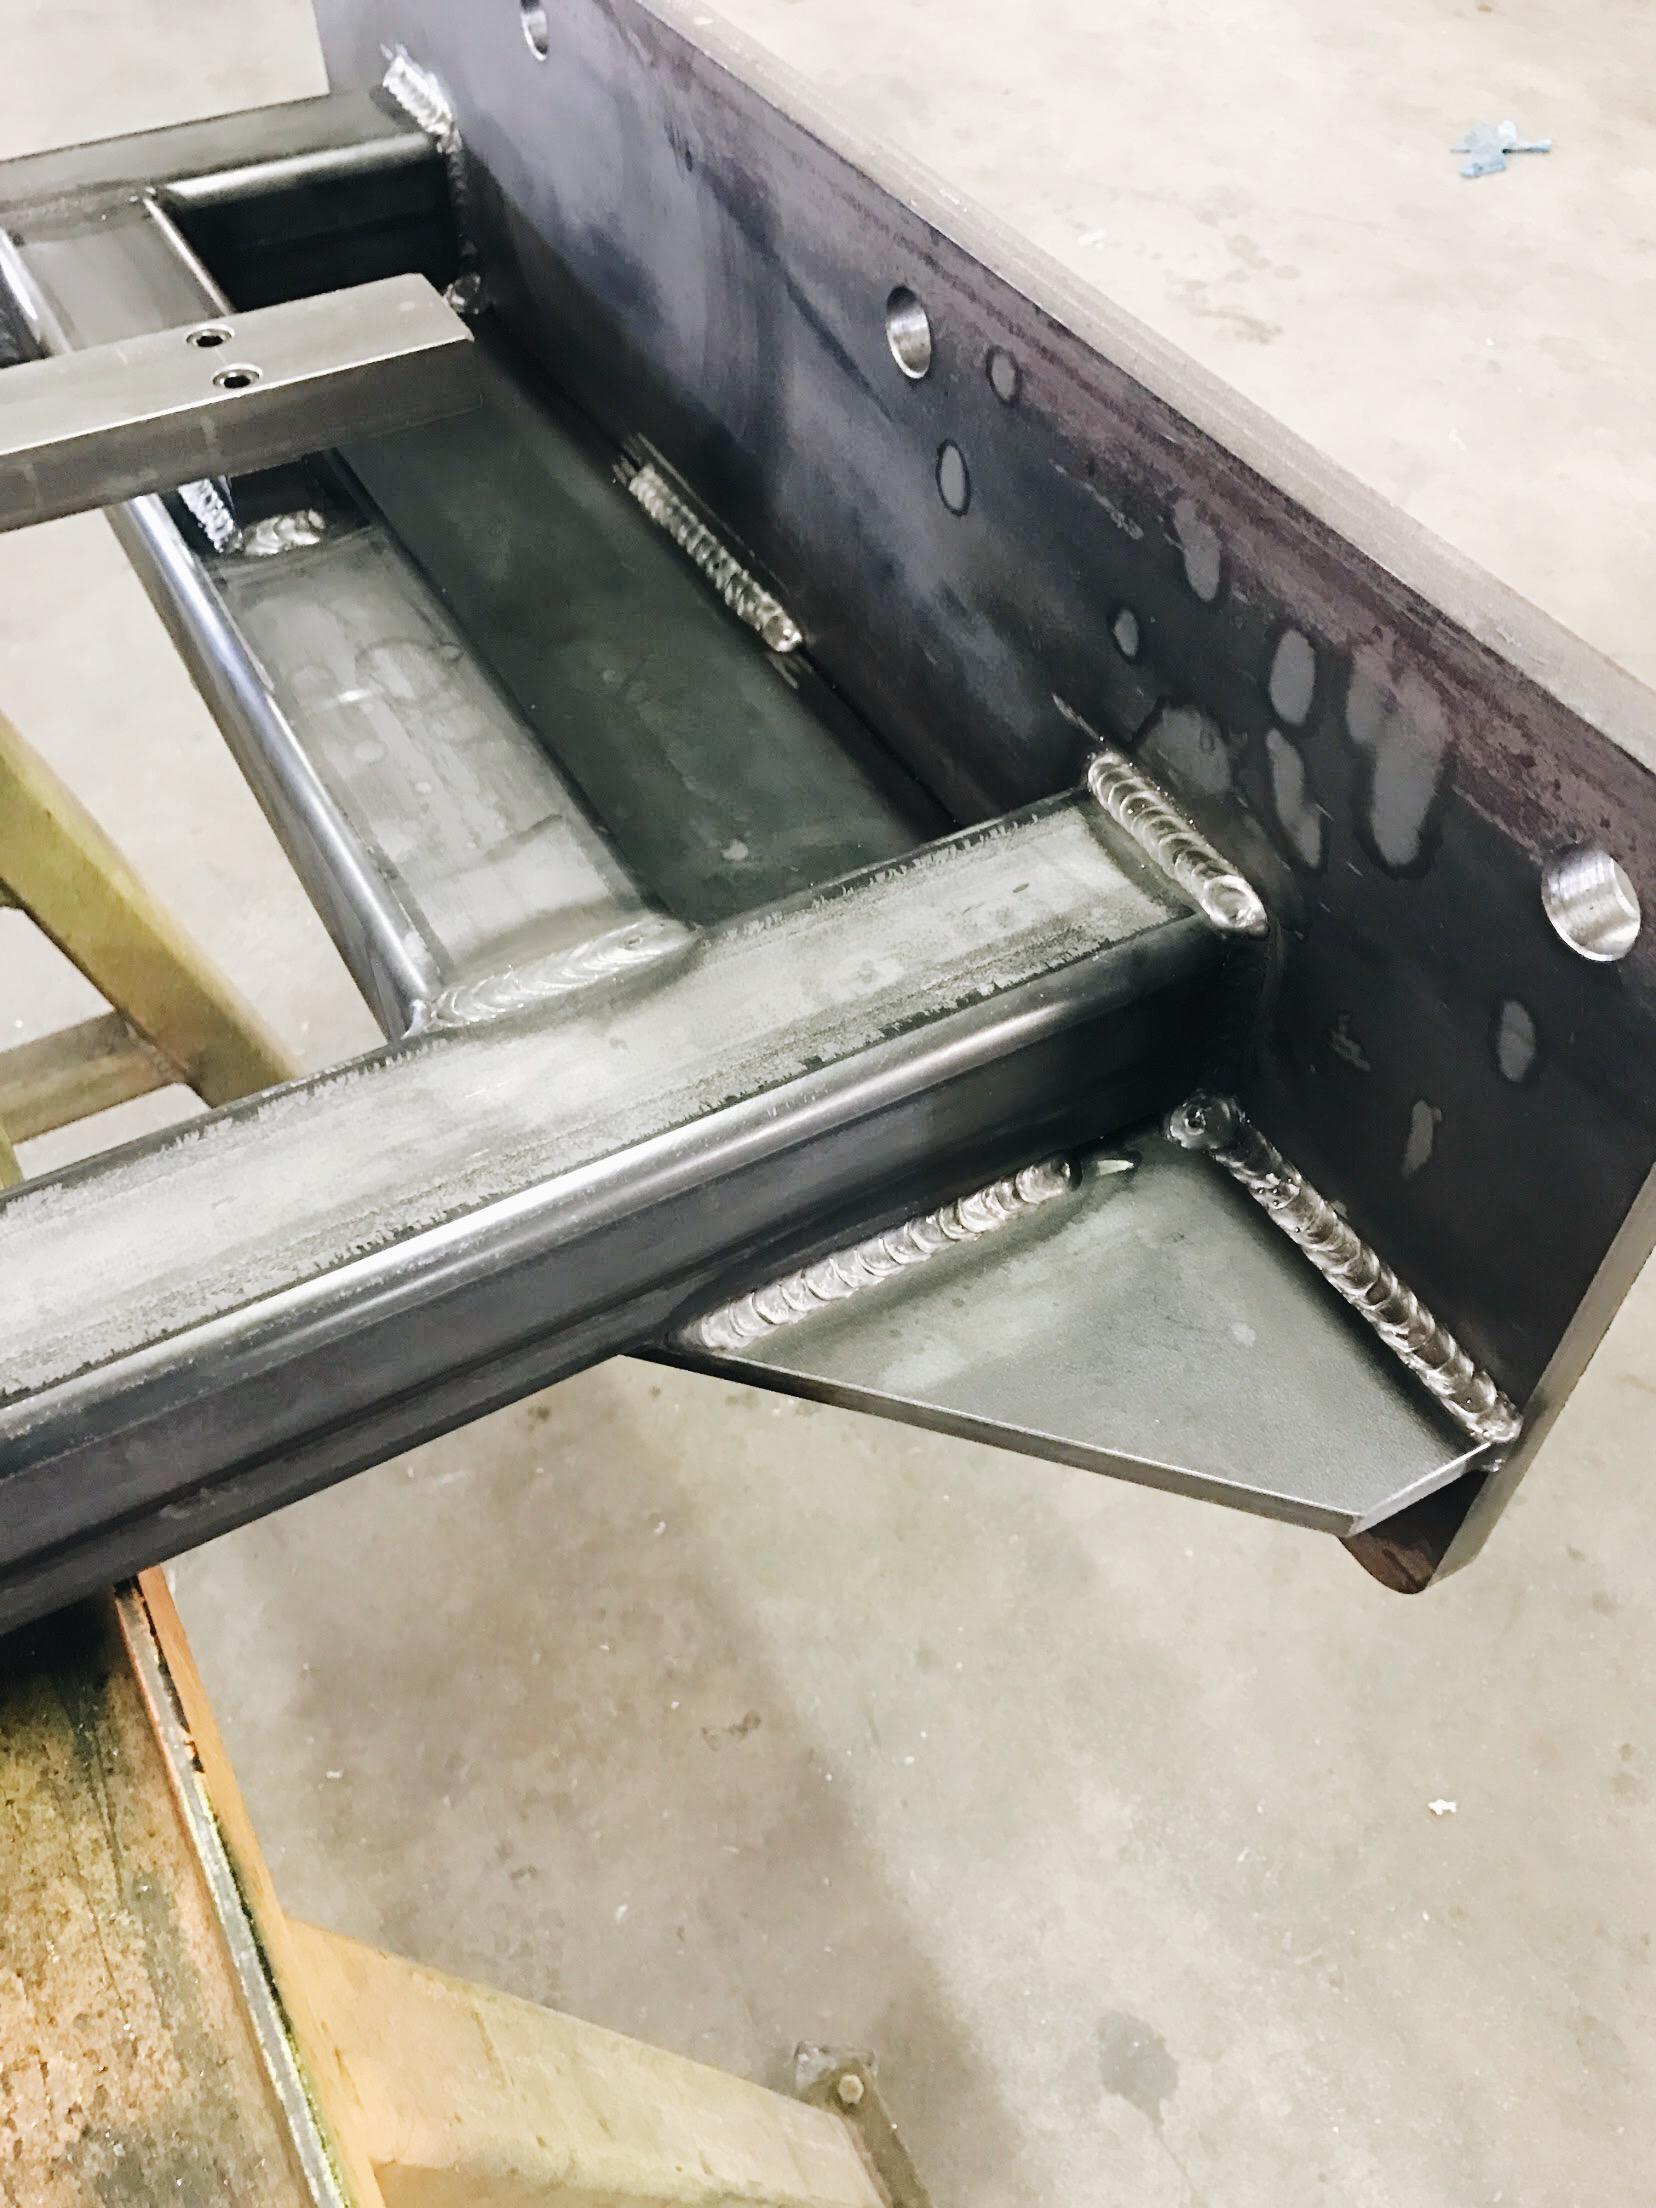 fabrication texas industrial machine & design 3.jpg